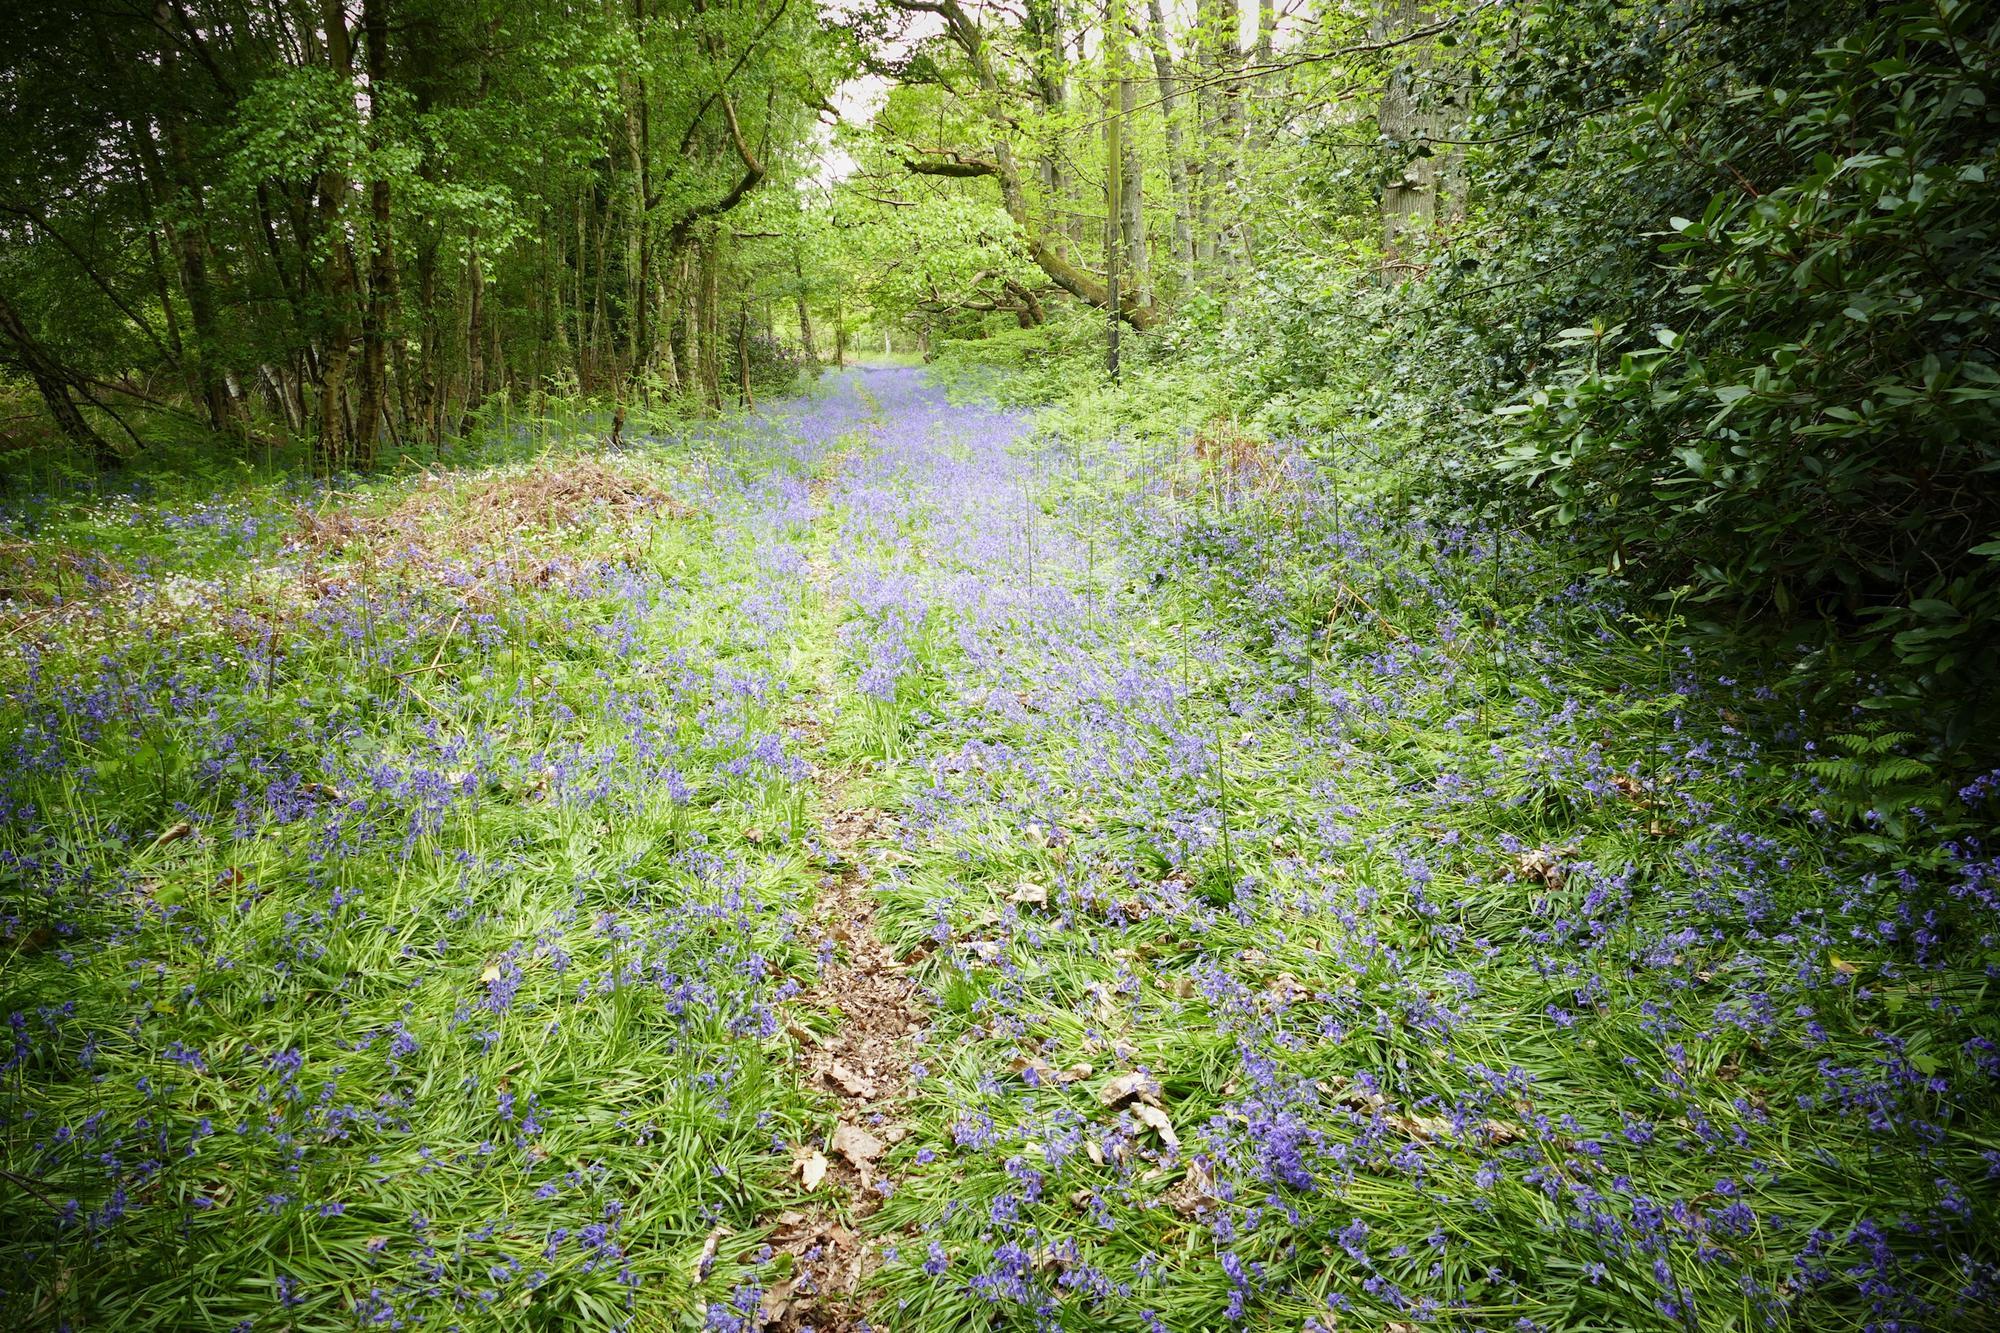 Hailsham Camping | Best campsites in Hailsham, Sussex